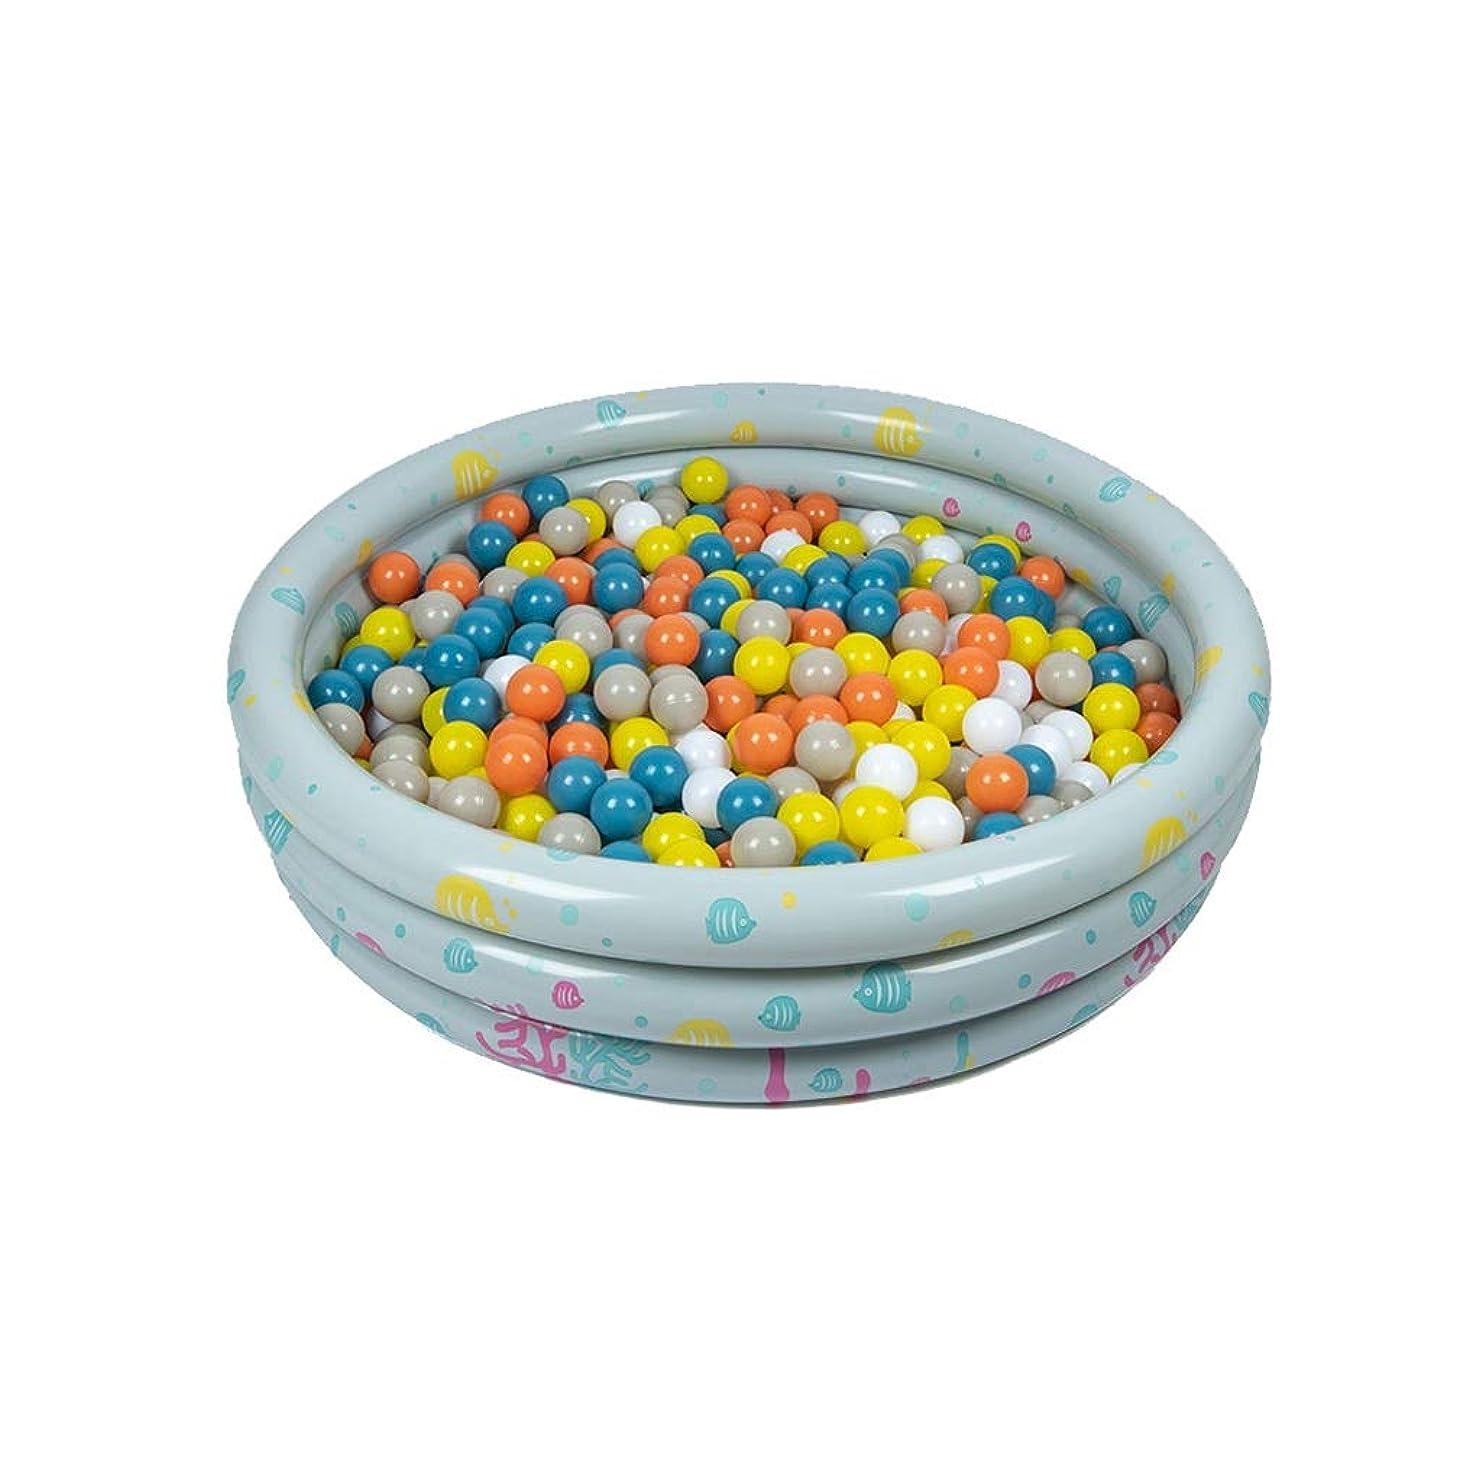 LIUFS-フェンス 子供のマリンボールプール屋内家庭用インフレータブルカラーボール波プールフェンス子供のおもちゃ (Size : Ocean ball*100)